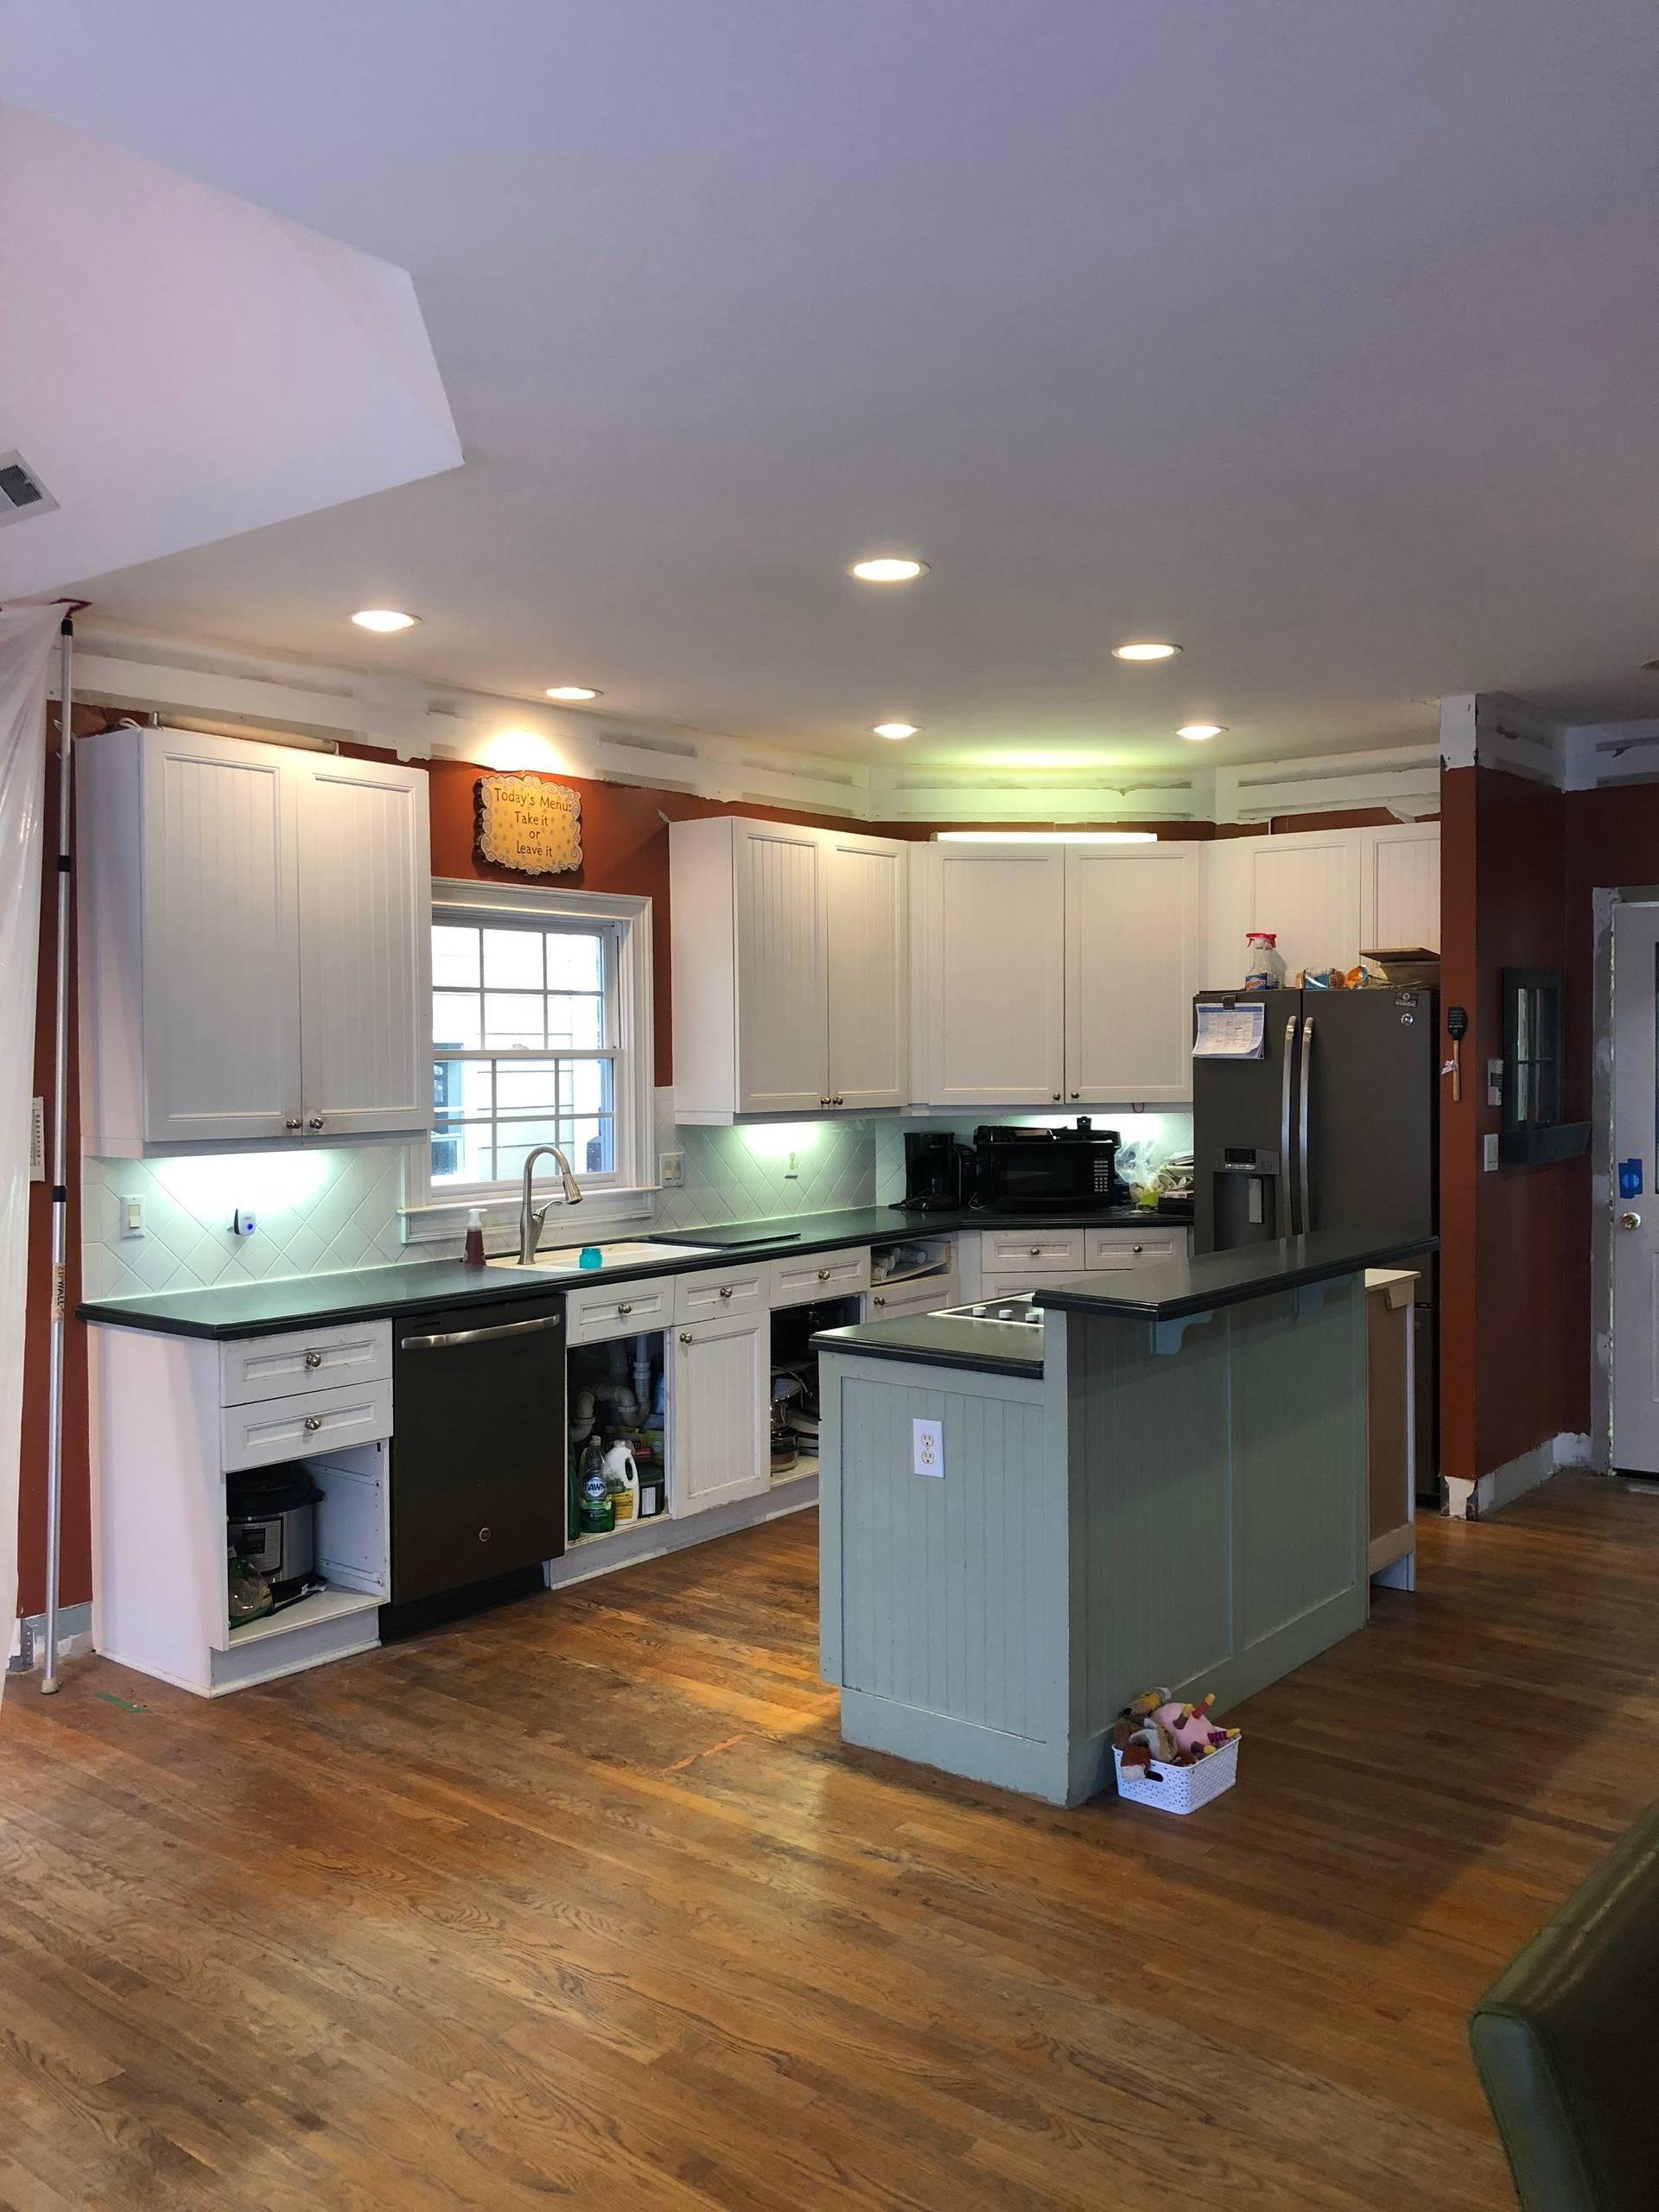 Peachtree City Farmhouse Kitchen Remodel